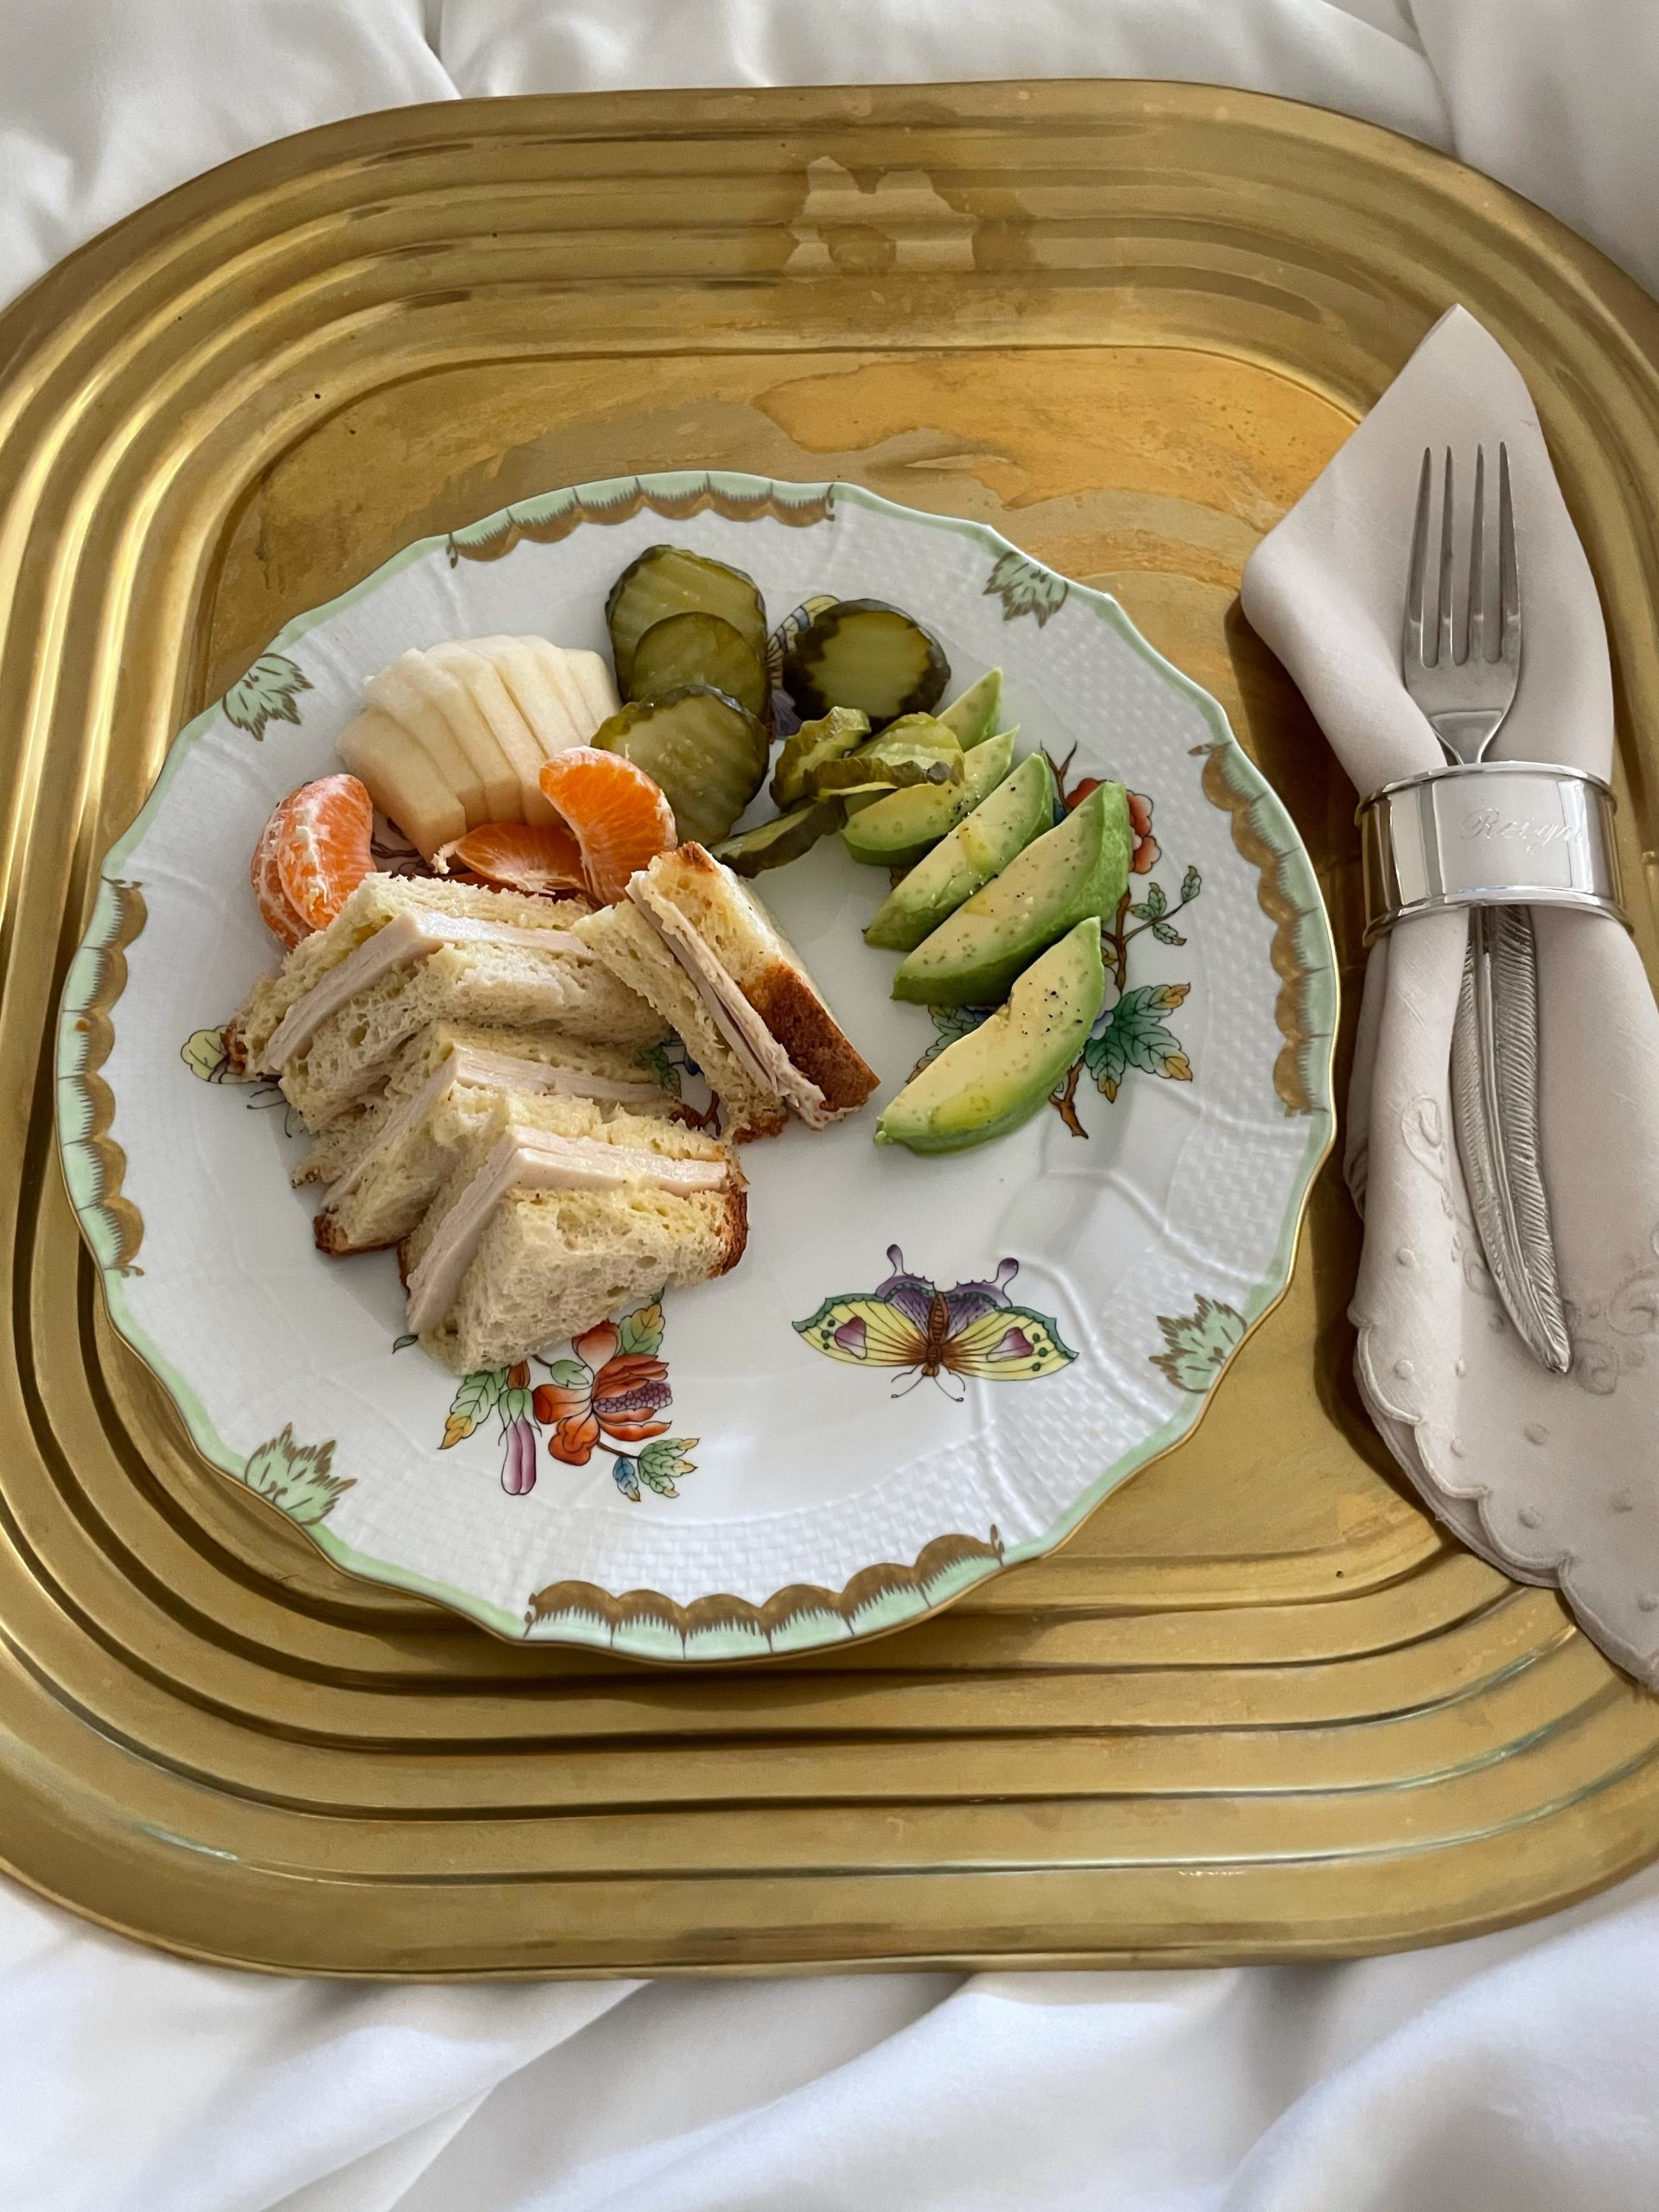 kourtney kardashian turkey sandwich lunch on tray